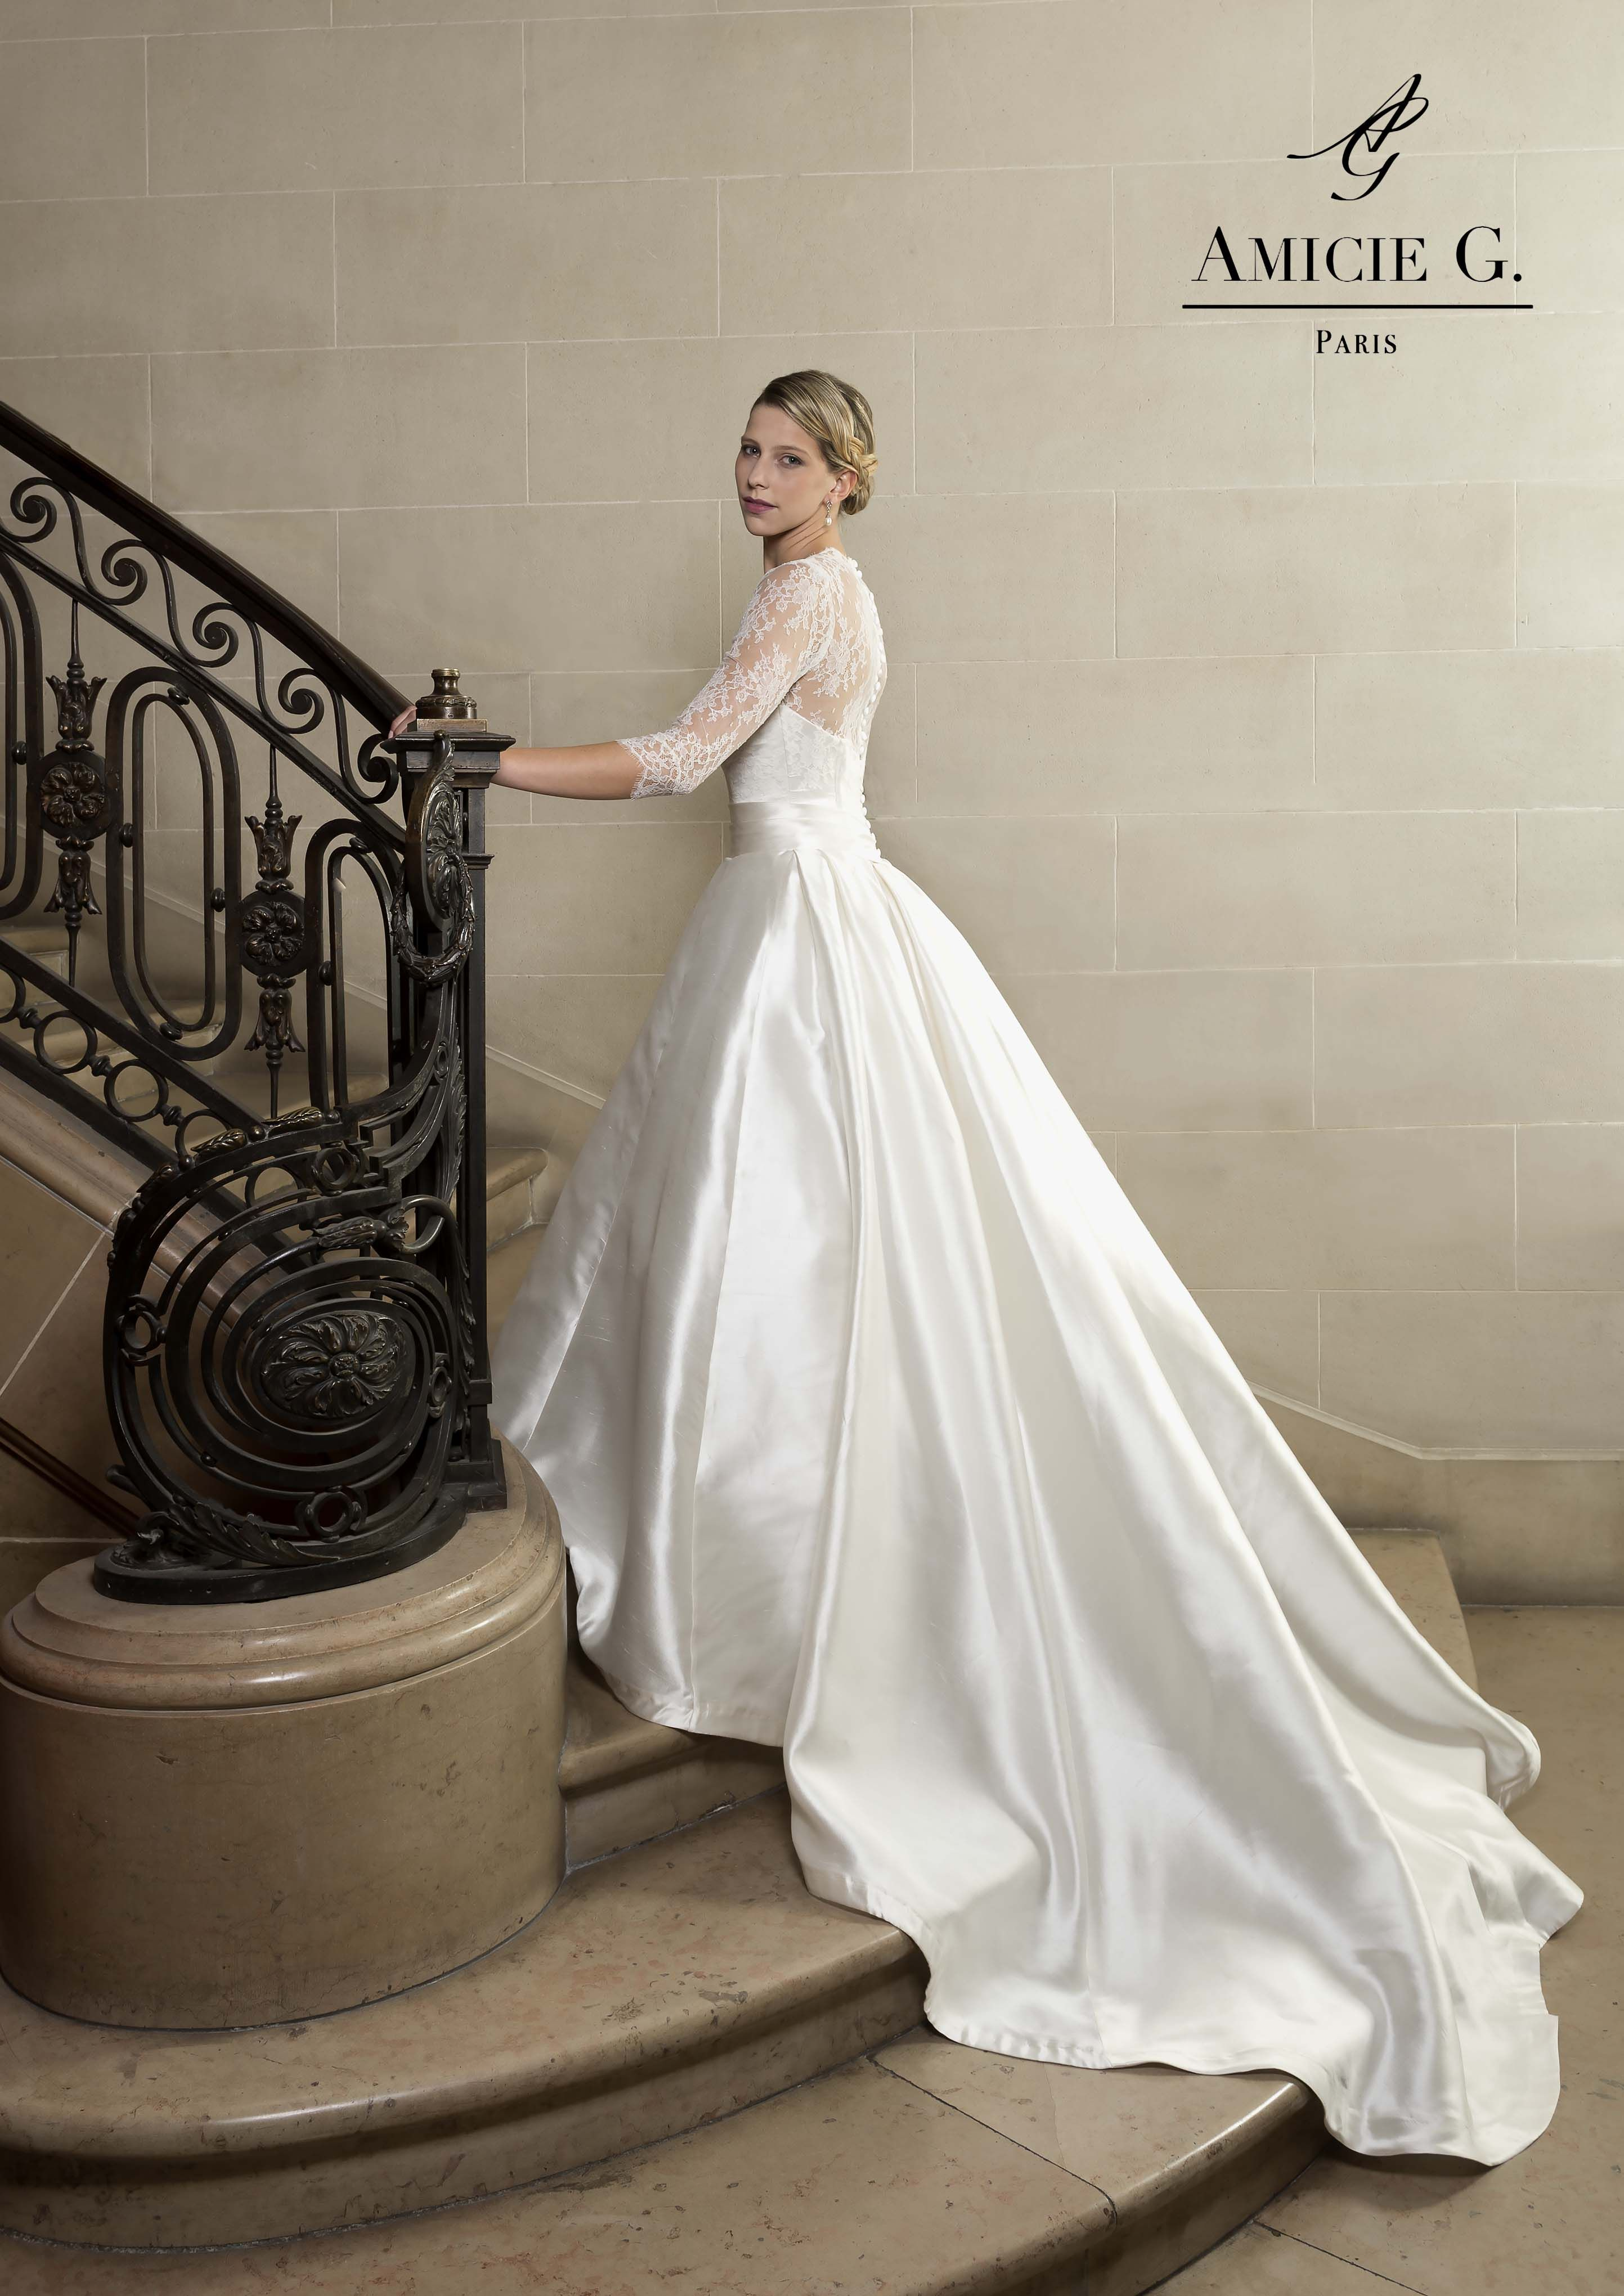 Amicie G. robe Chambord robe de mariée princesse